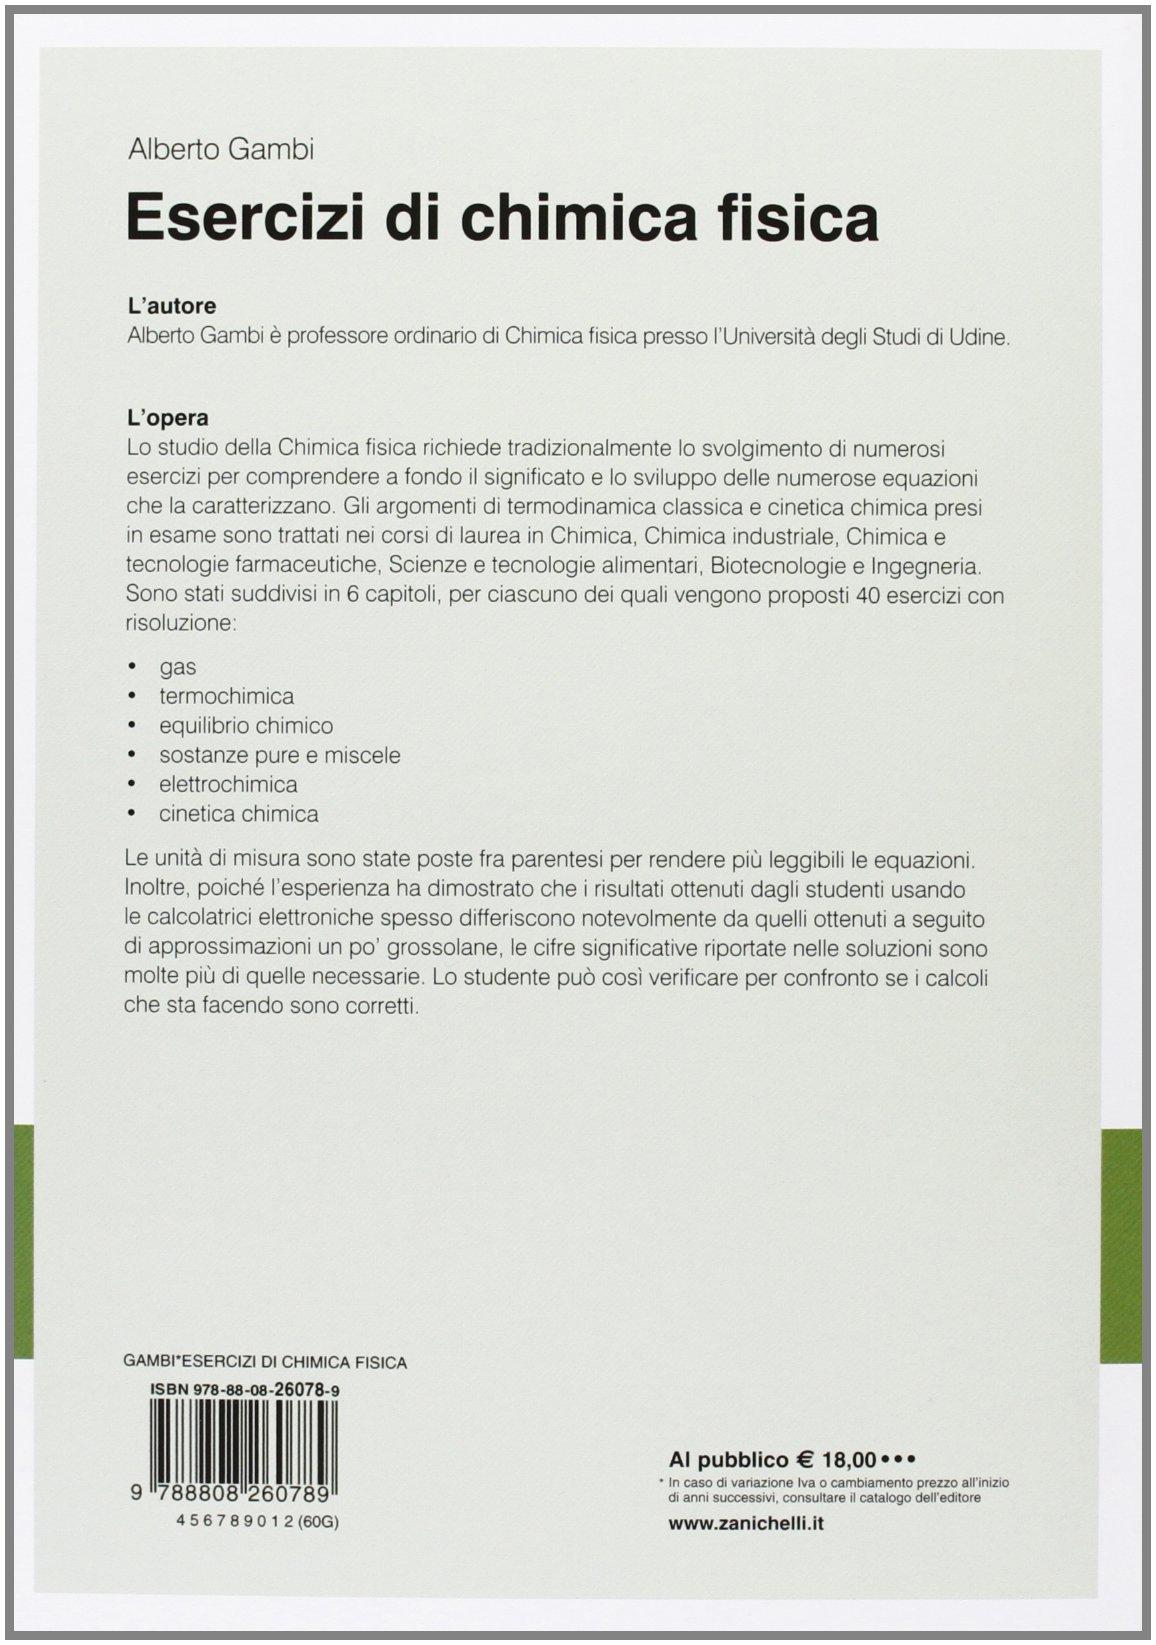 Atkins chimica fisica pdf free download